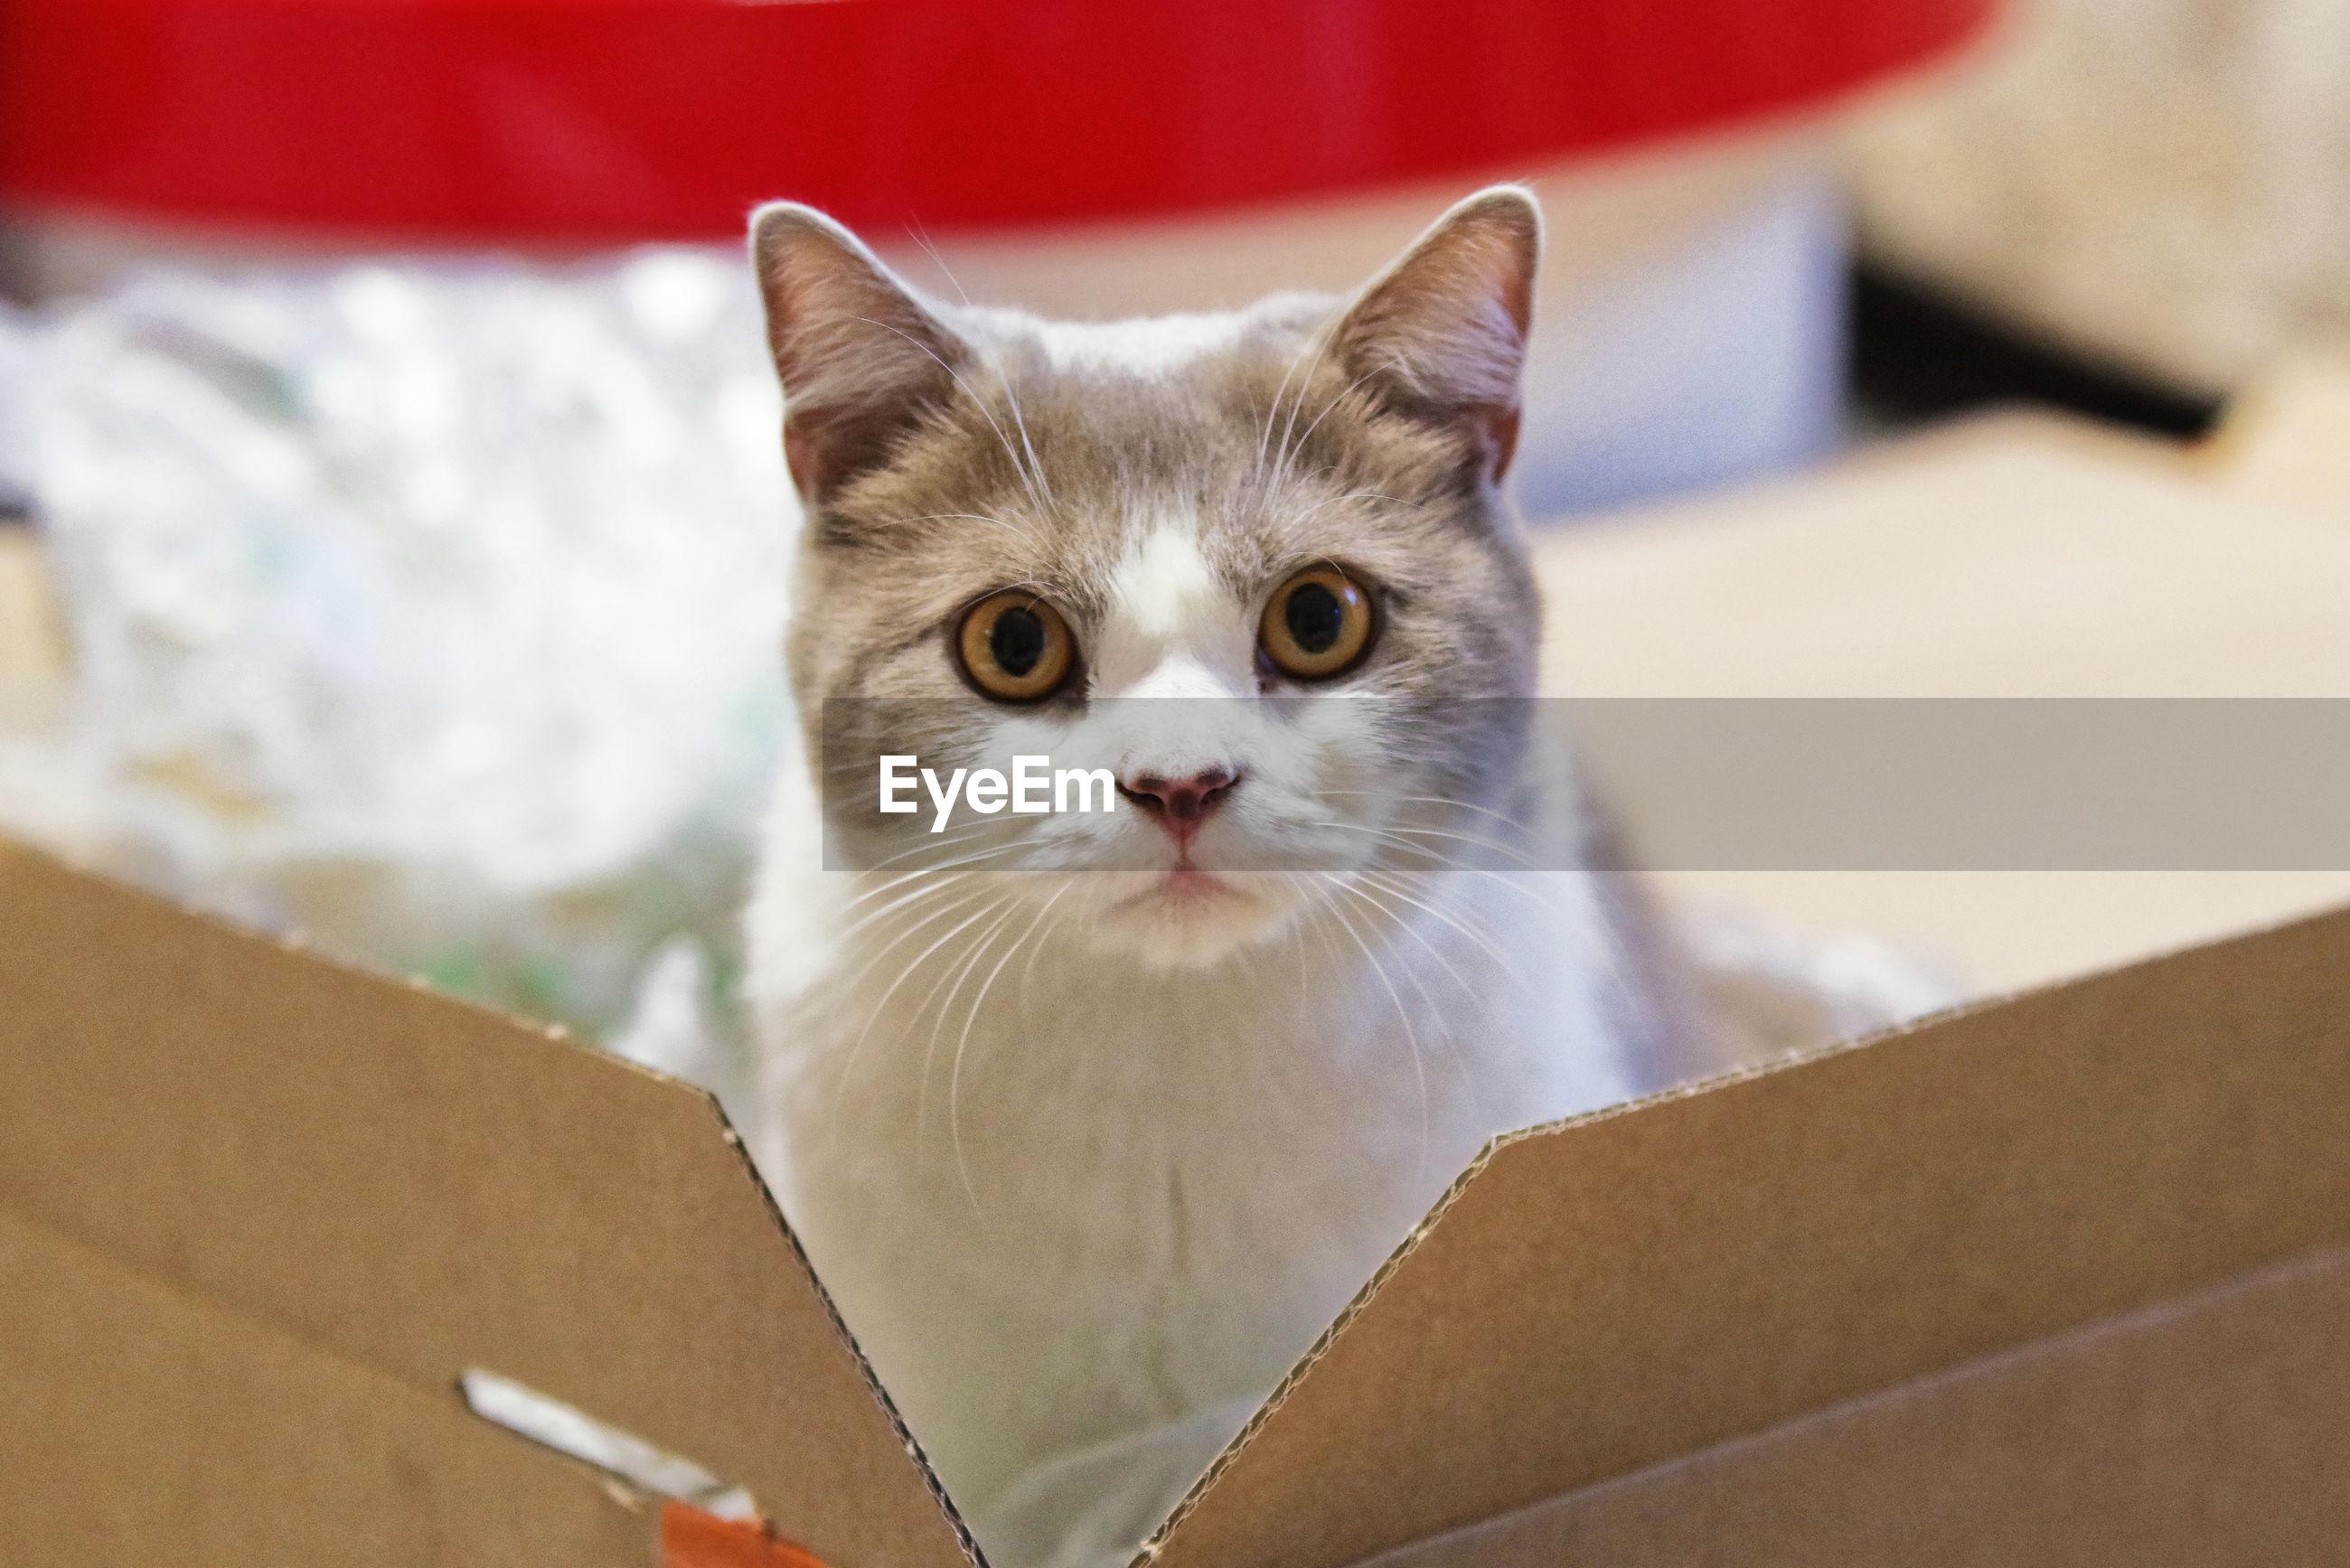 Portrait of cat in box